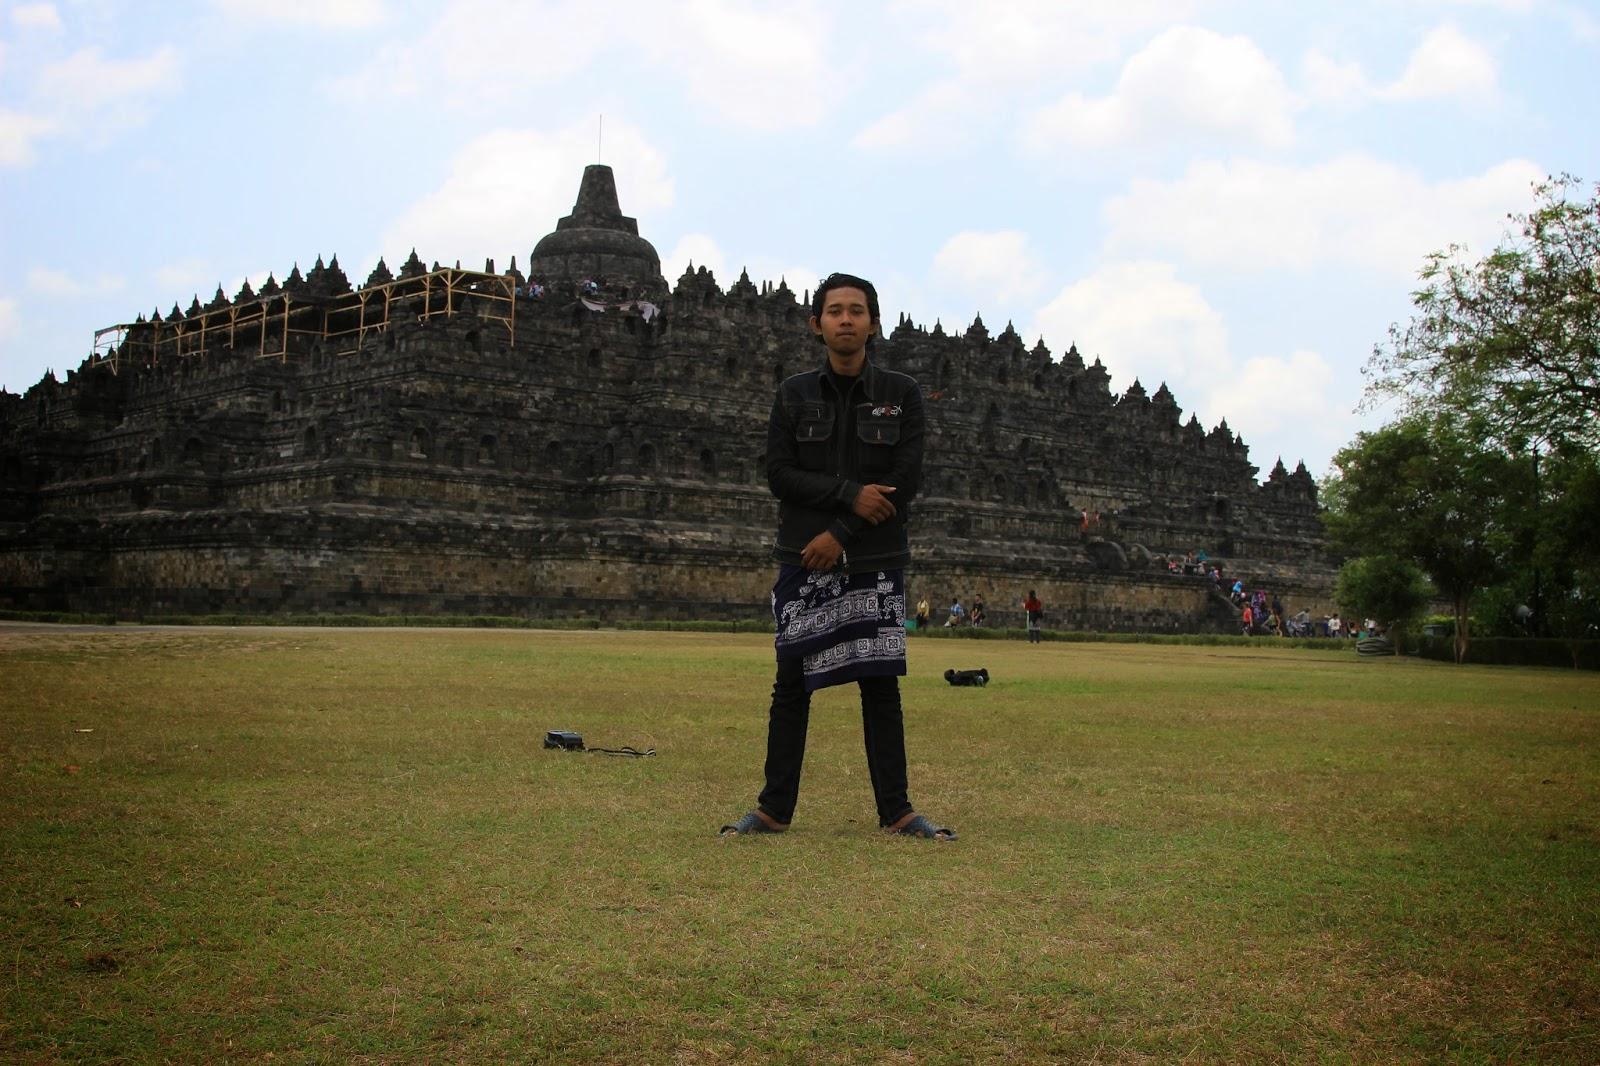 Daftar Tempat Wisata di Jogjakarta